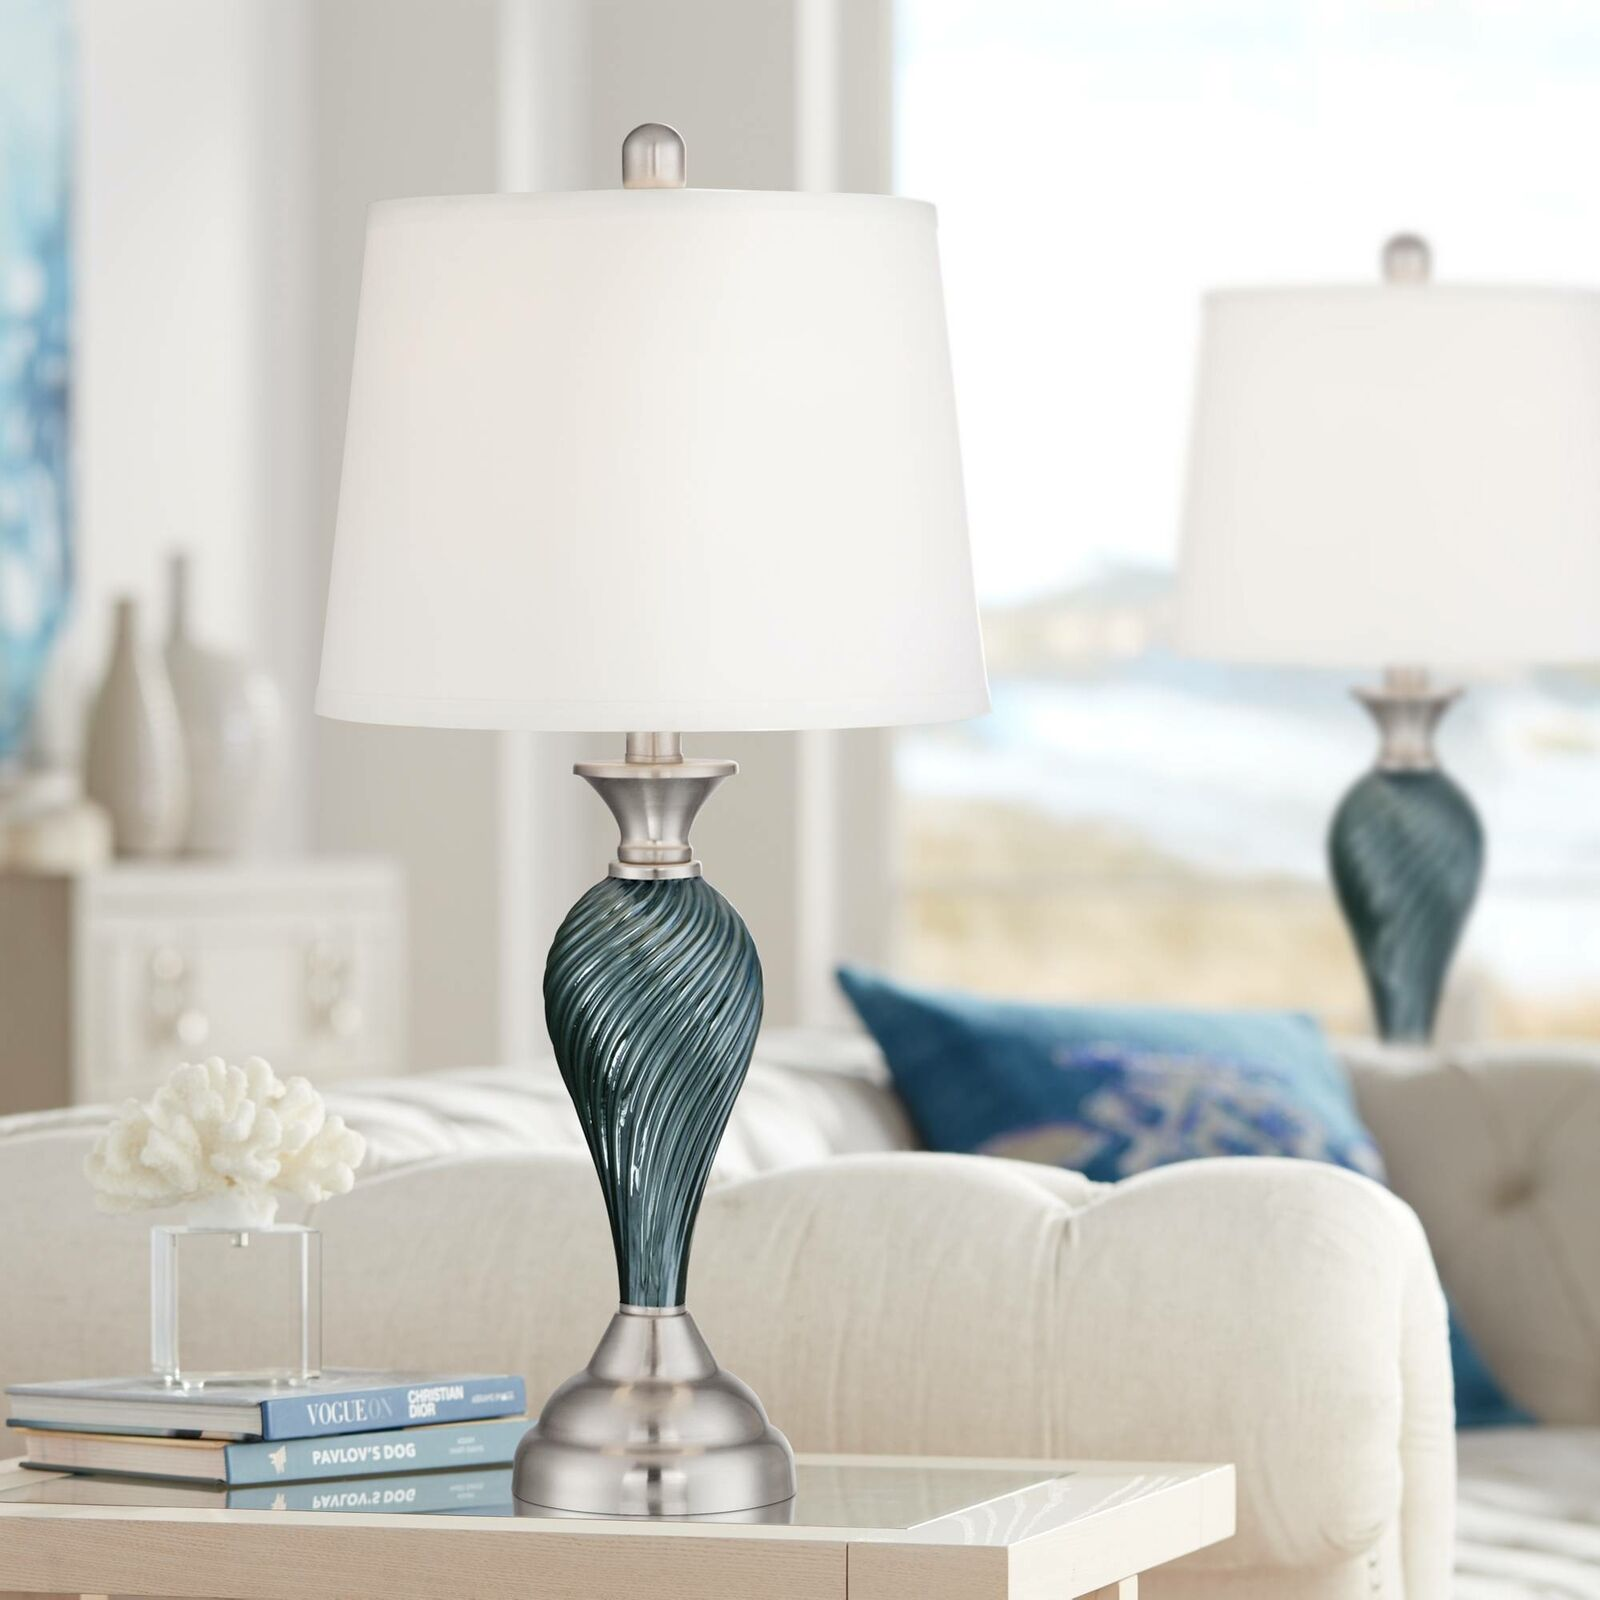 Modern Table Lamps Set Of 2 Green Blue Glass Twist Column Living Room Bedroom For Sale Online